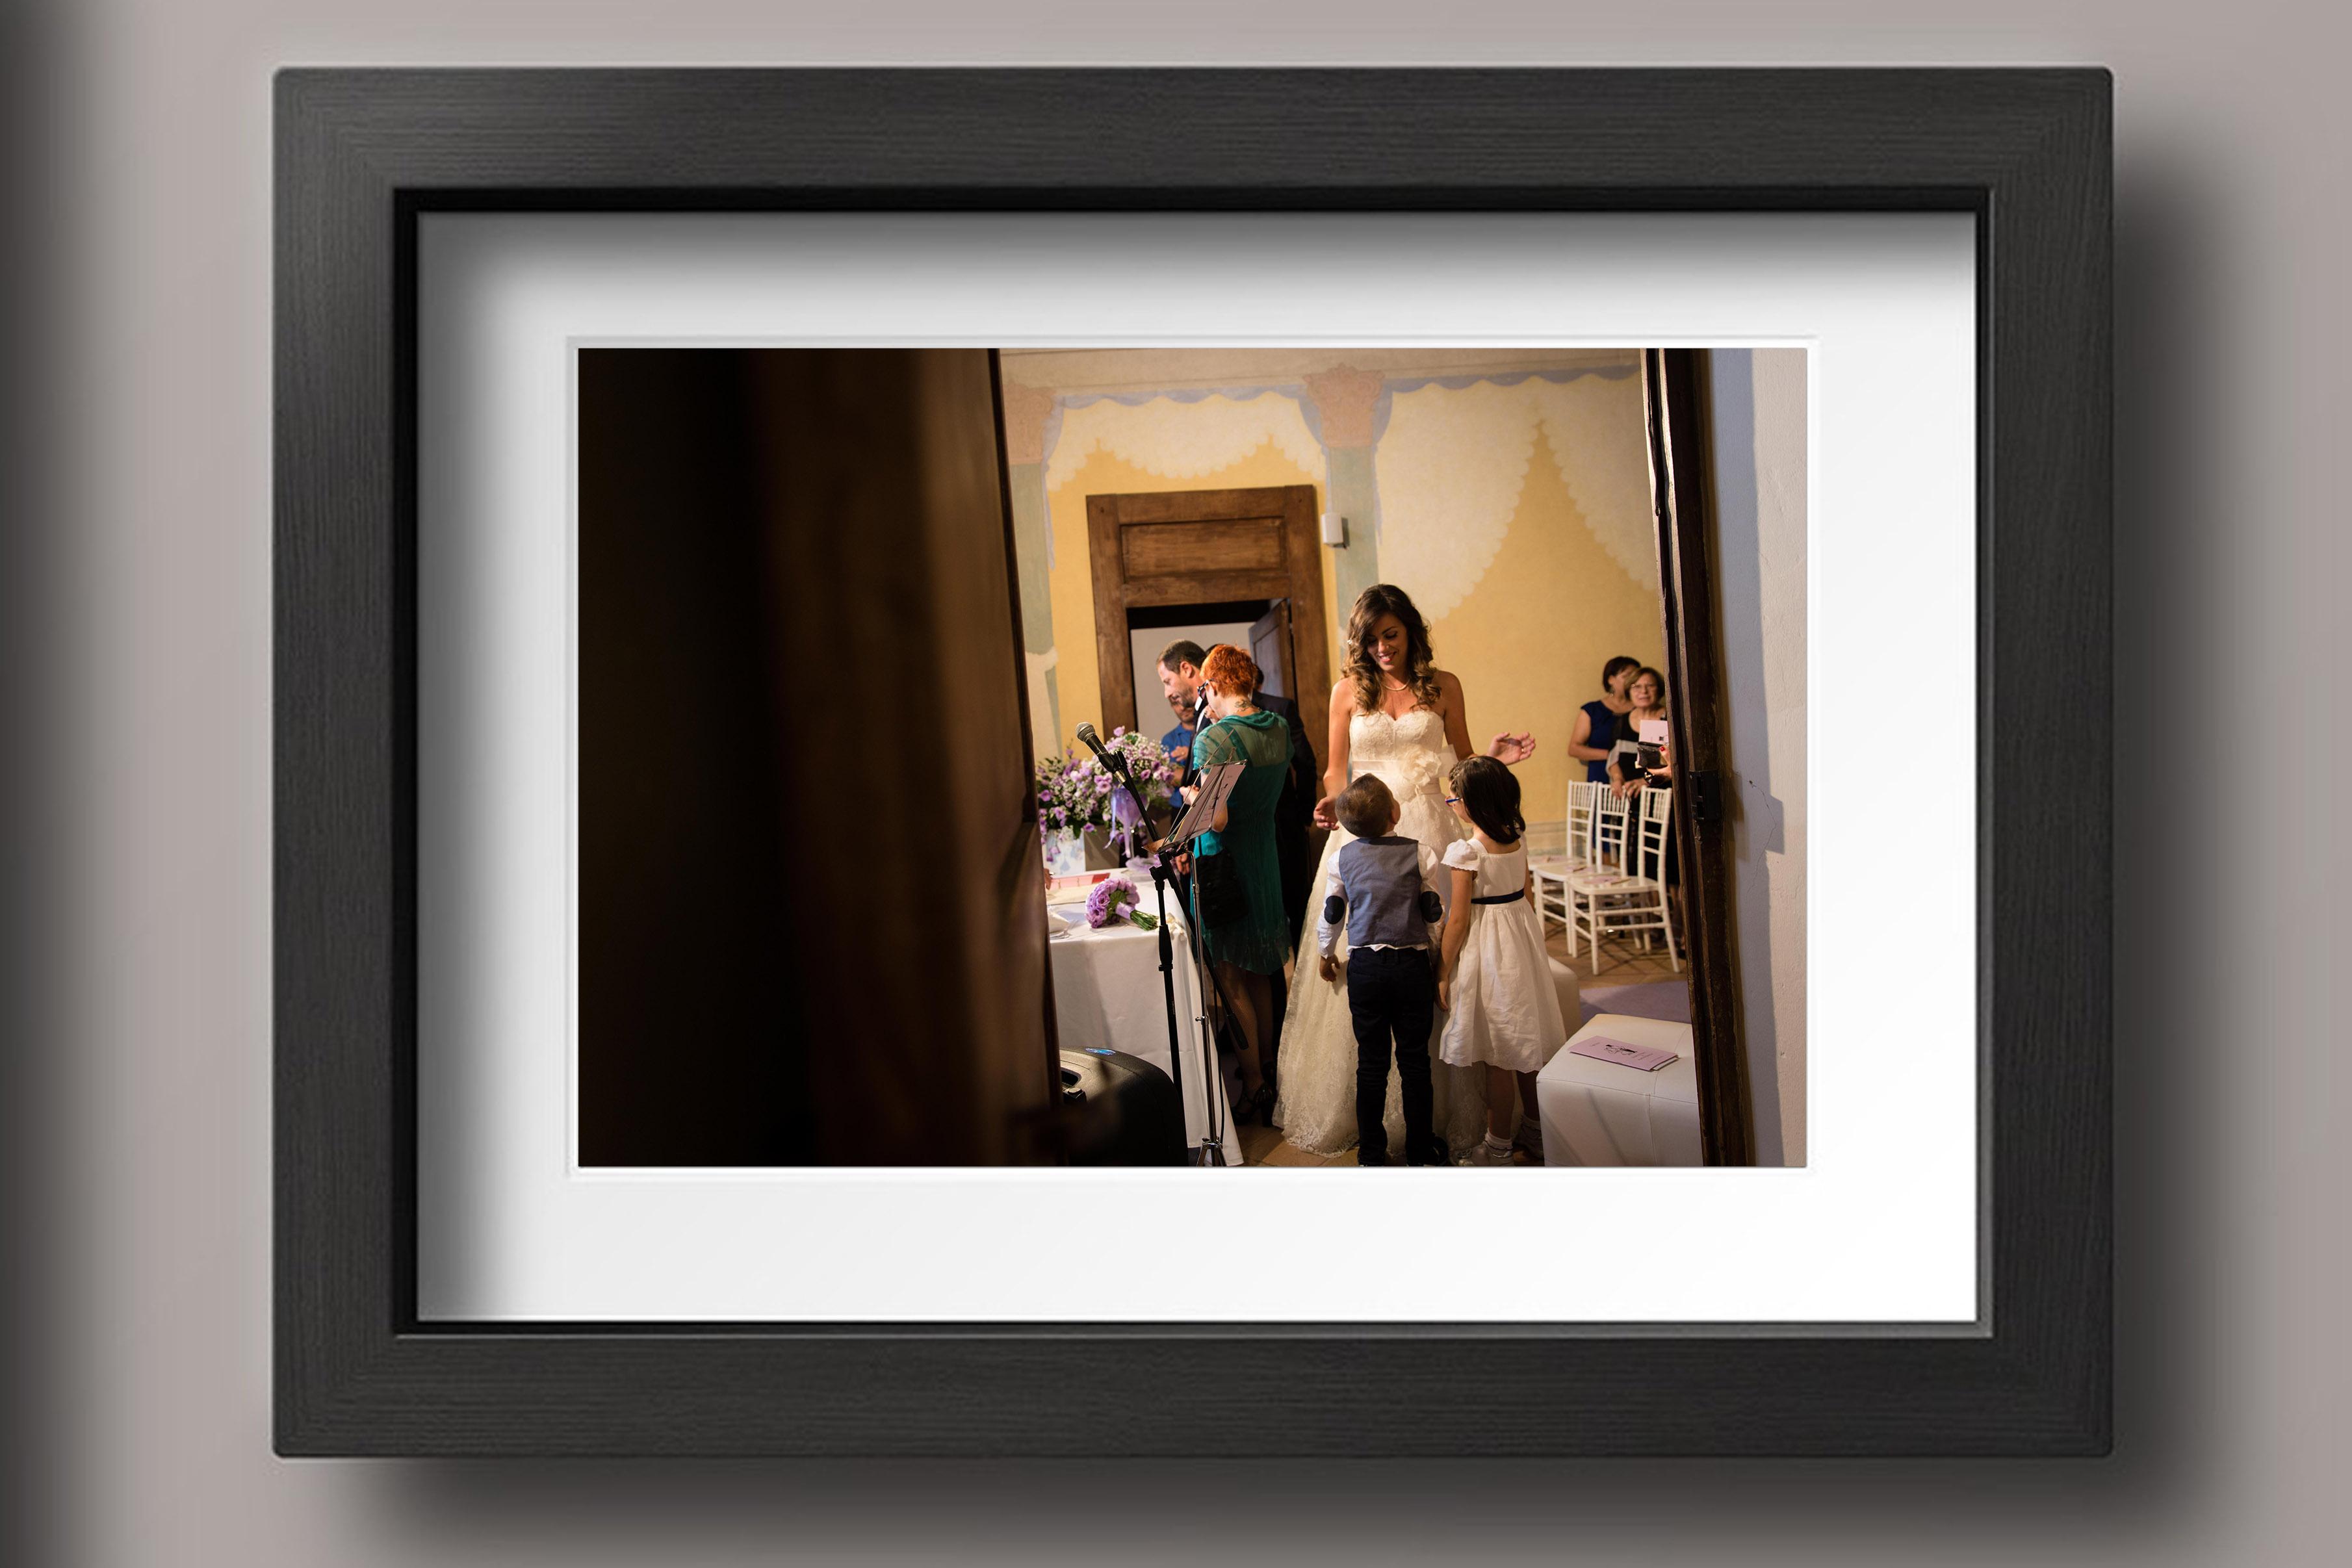 Matrimonio in stile PPA - Enzo e Marilisa - frame